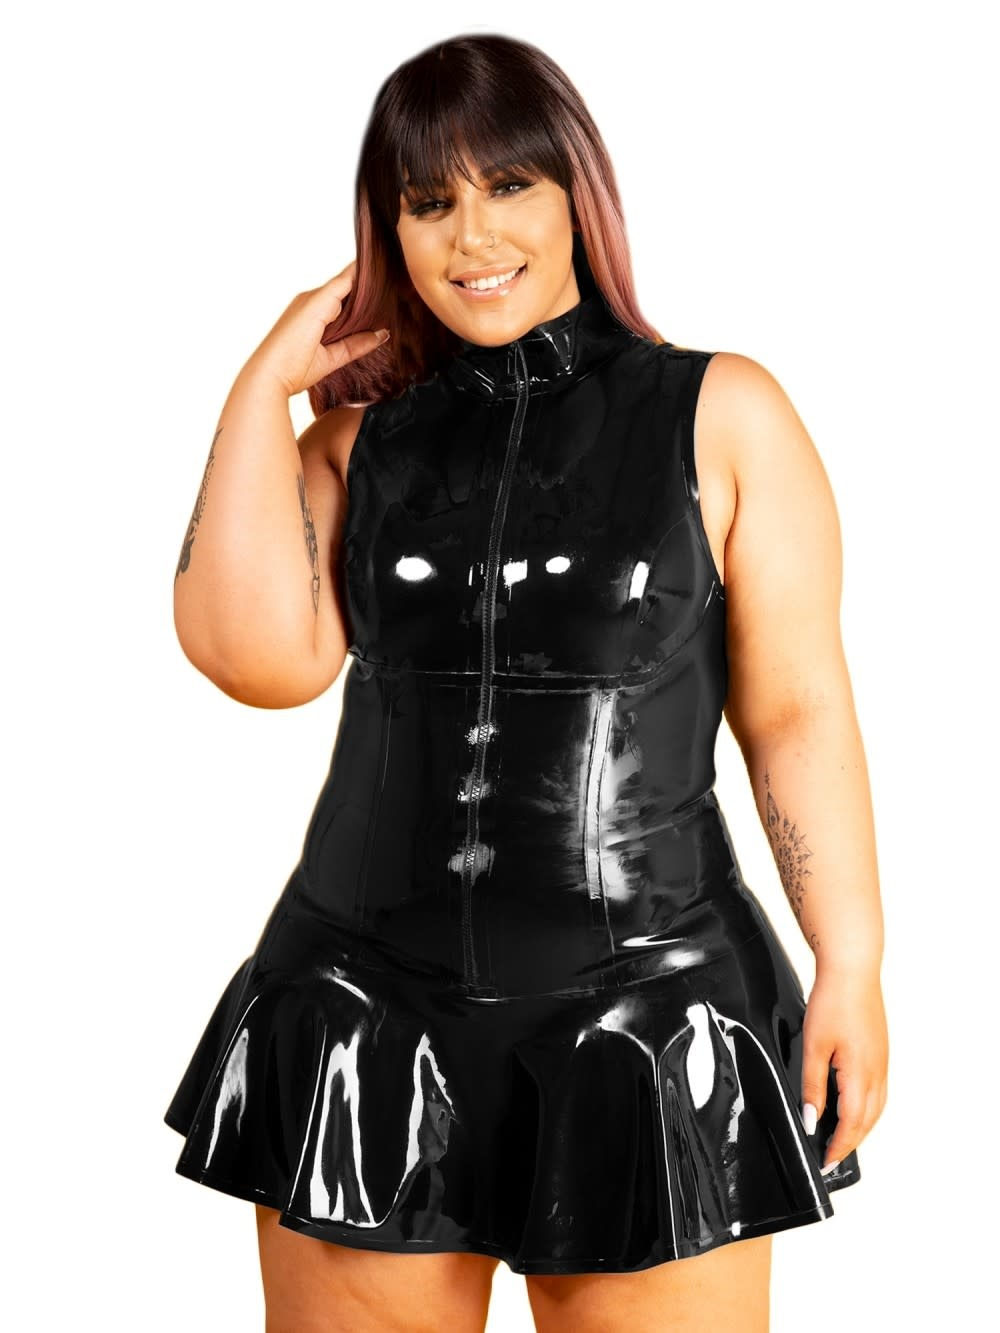 Glamazon Latex Dress